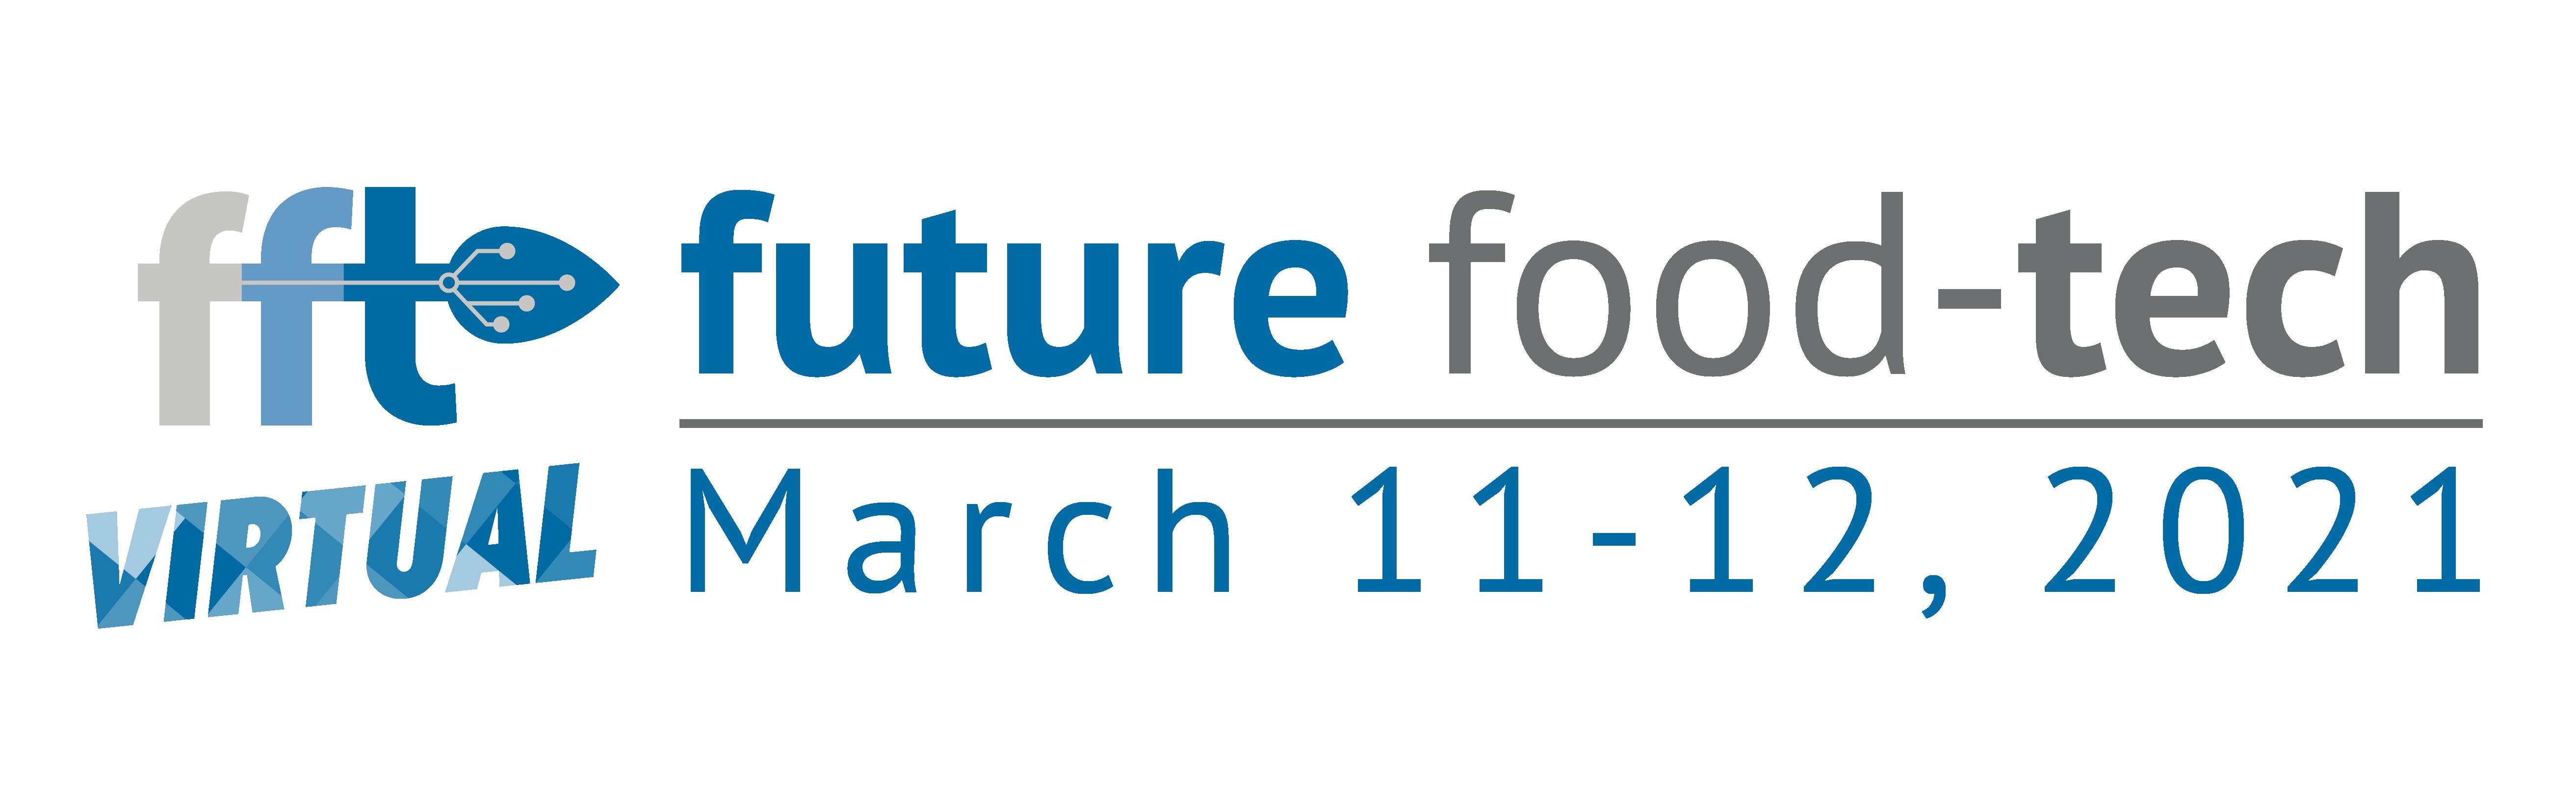 Home: Future Food-Tech San Francisco, March 11-12, 2021